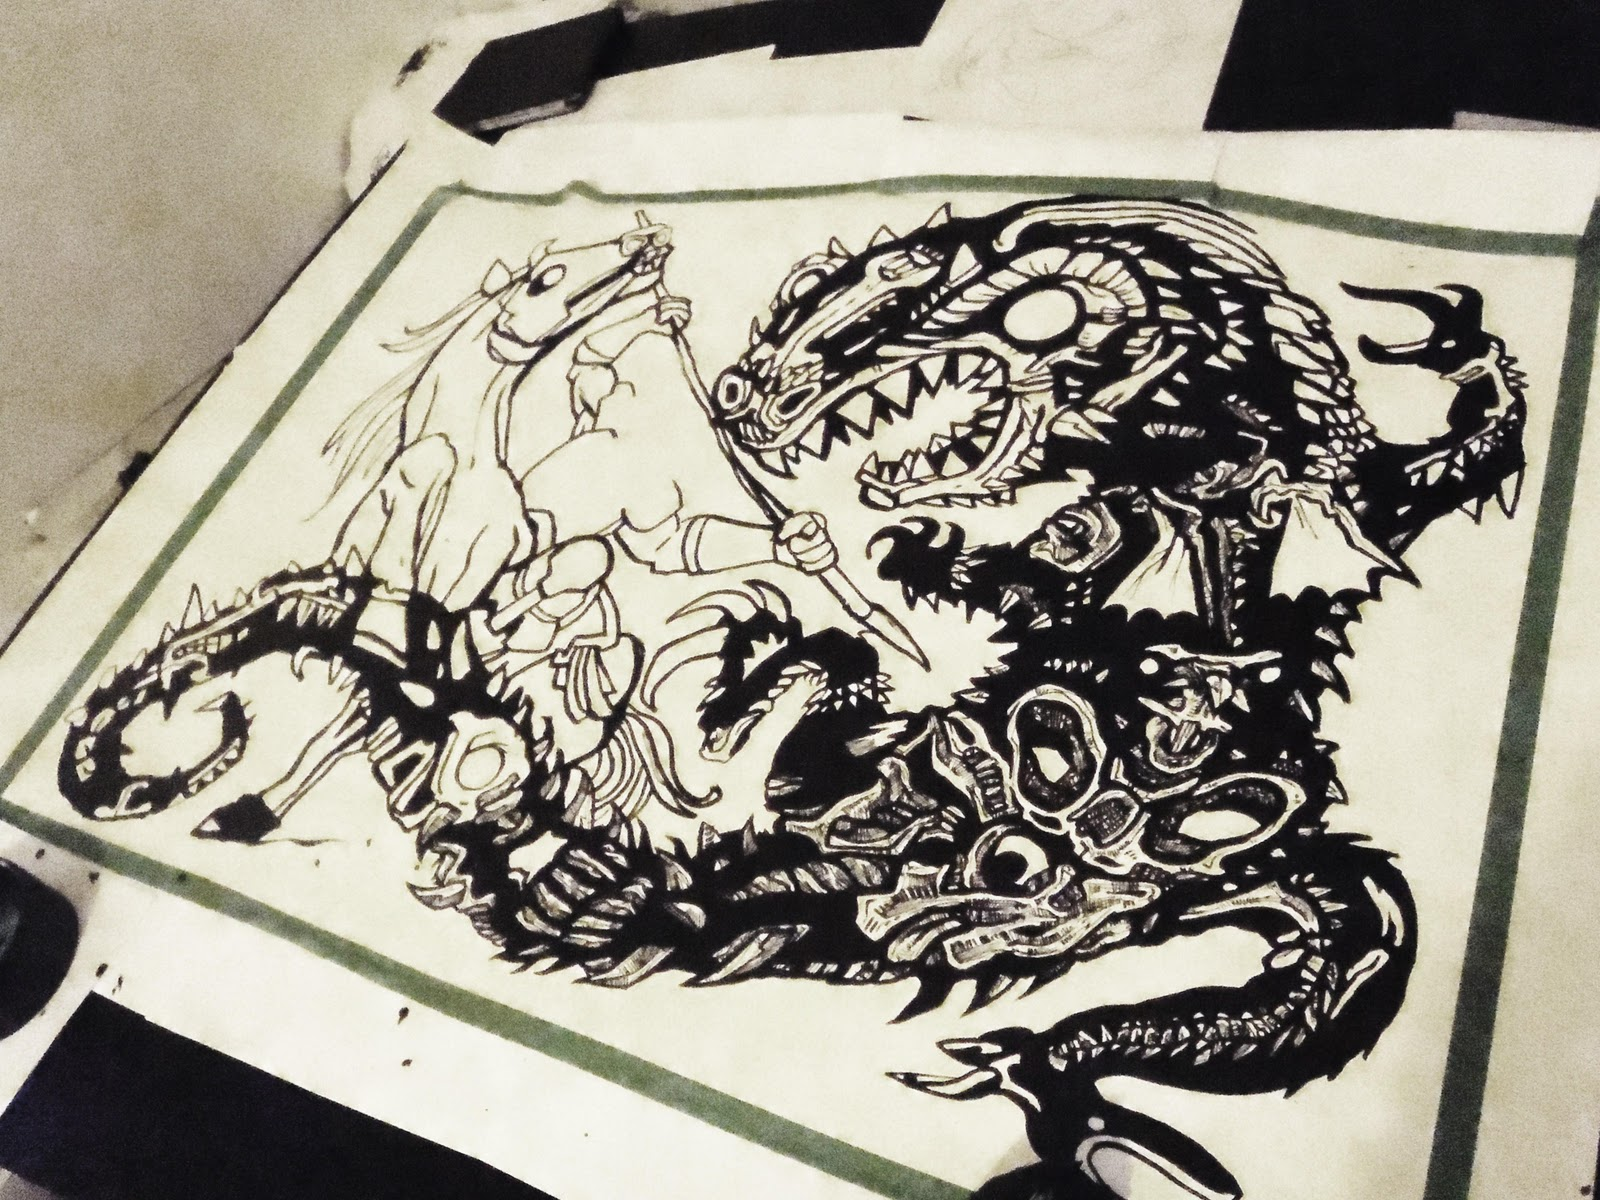 hey apathy alternative comics and art drawings of dragons